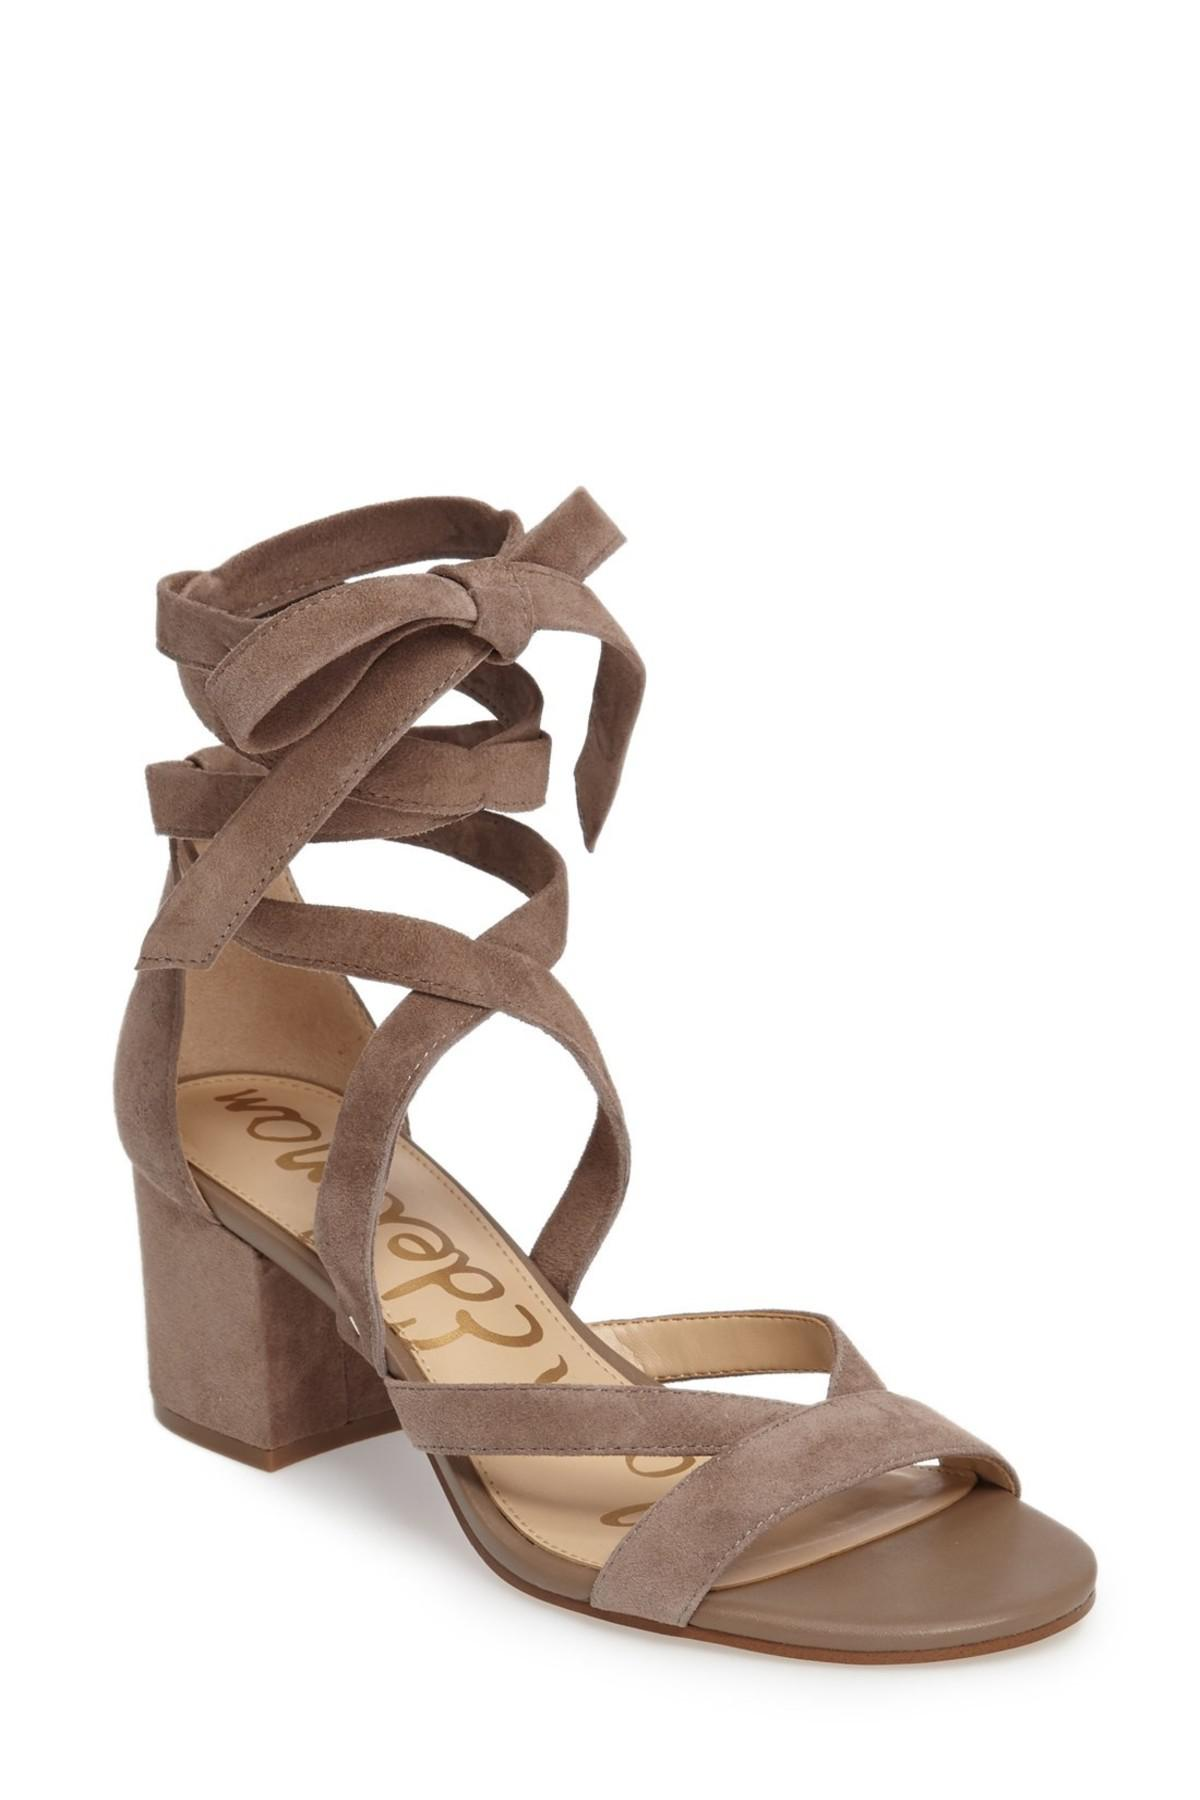 550a885a457a Lyst - Sam Edelman Sheri Wrap-ankle Block Heel Sandal in Brown